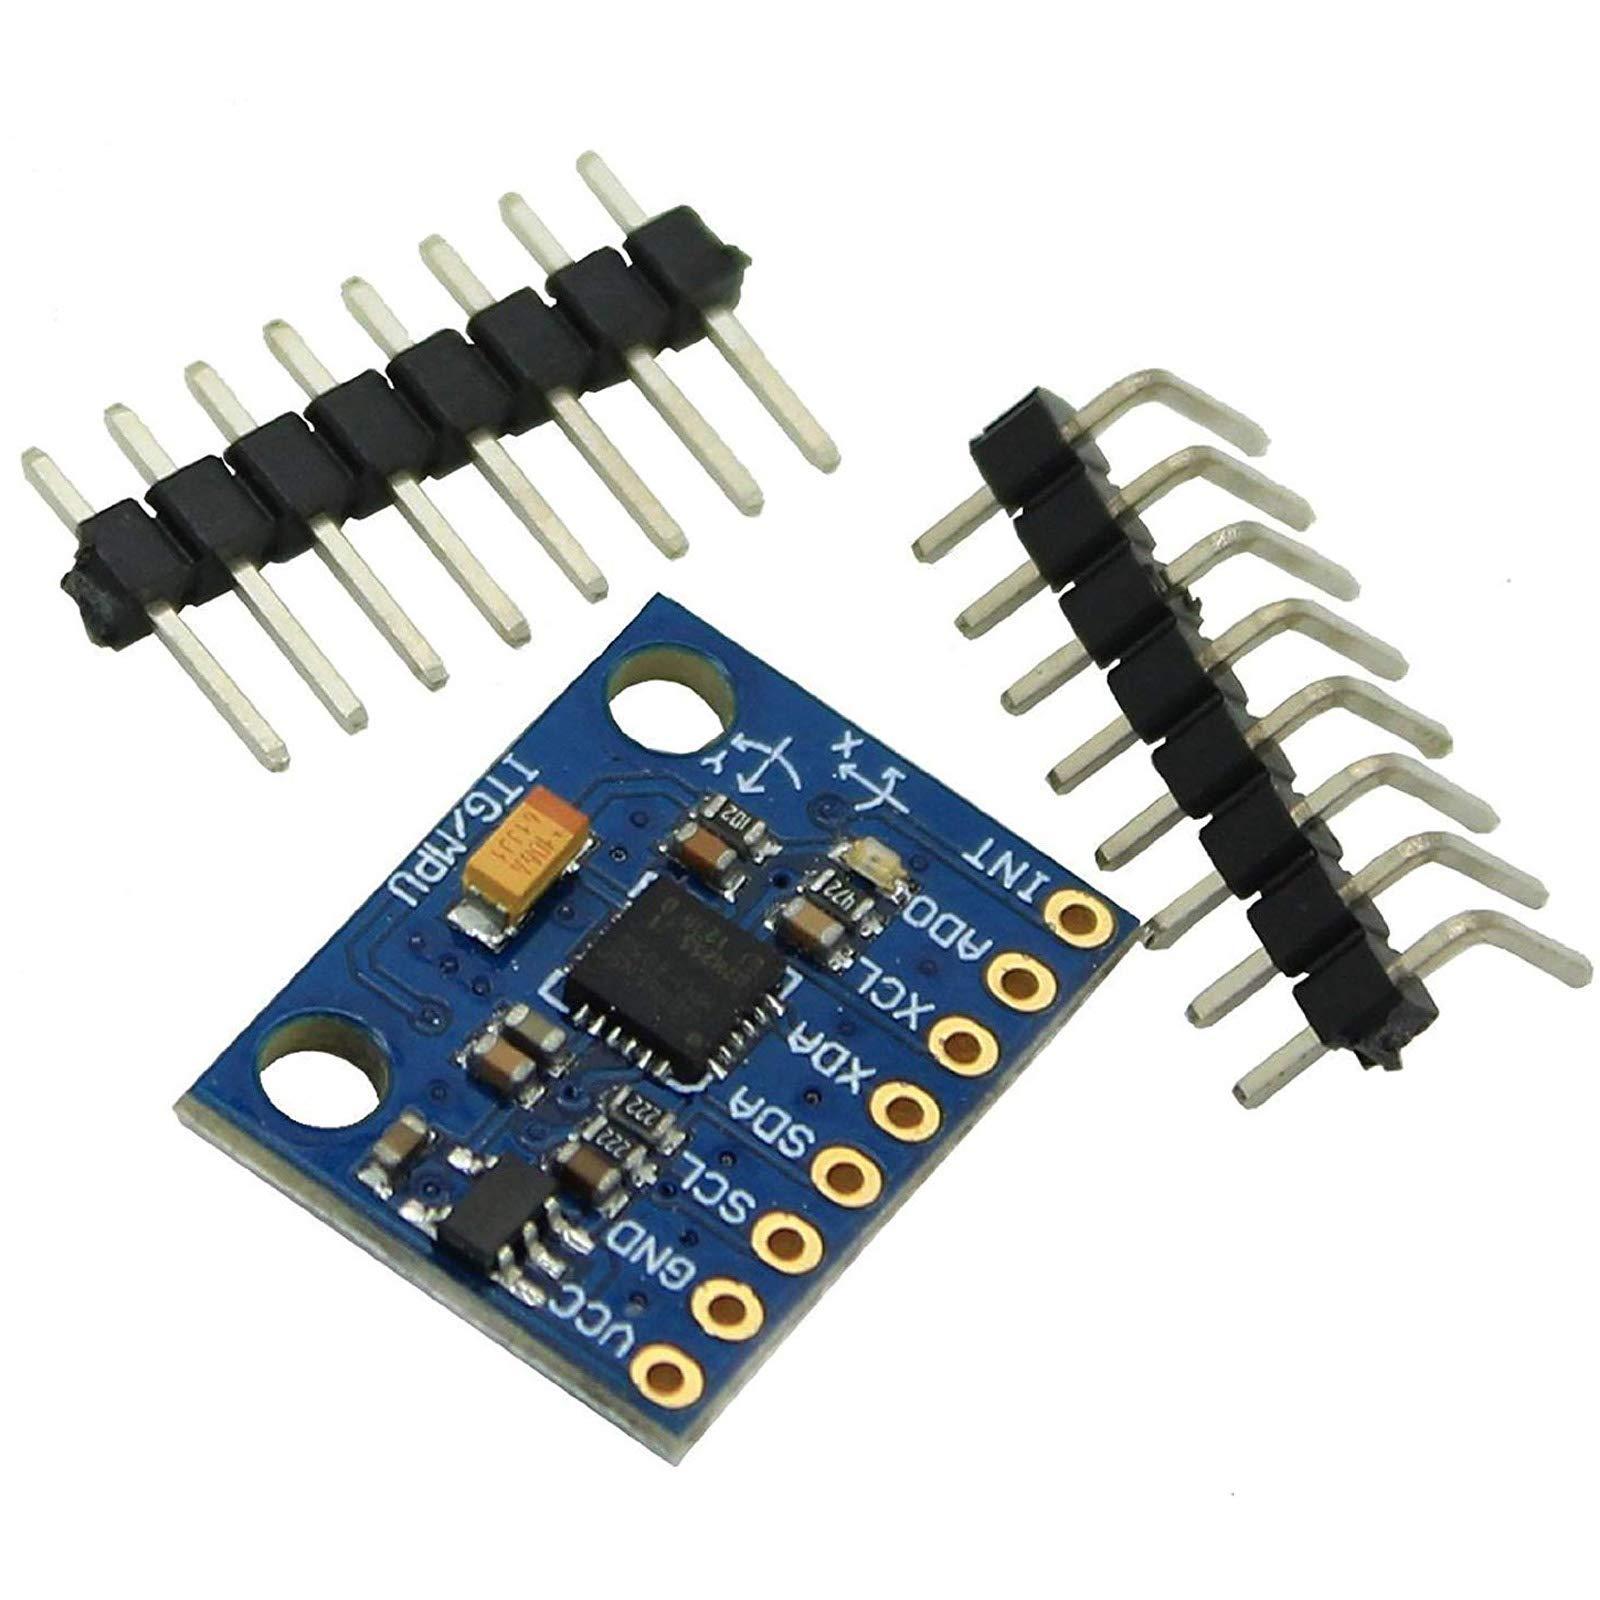 Gy-521 MPU-6050 MPU6050 Module 3 Axis Analog Gyro Sensors+ 3 Axis Accelerometer Module by Generic (Image #1)